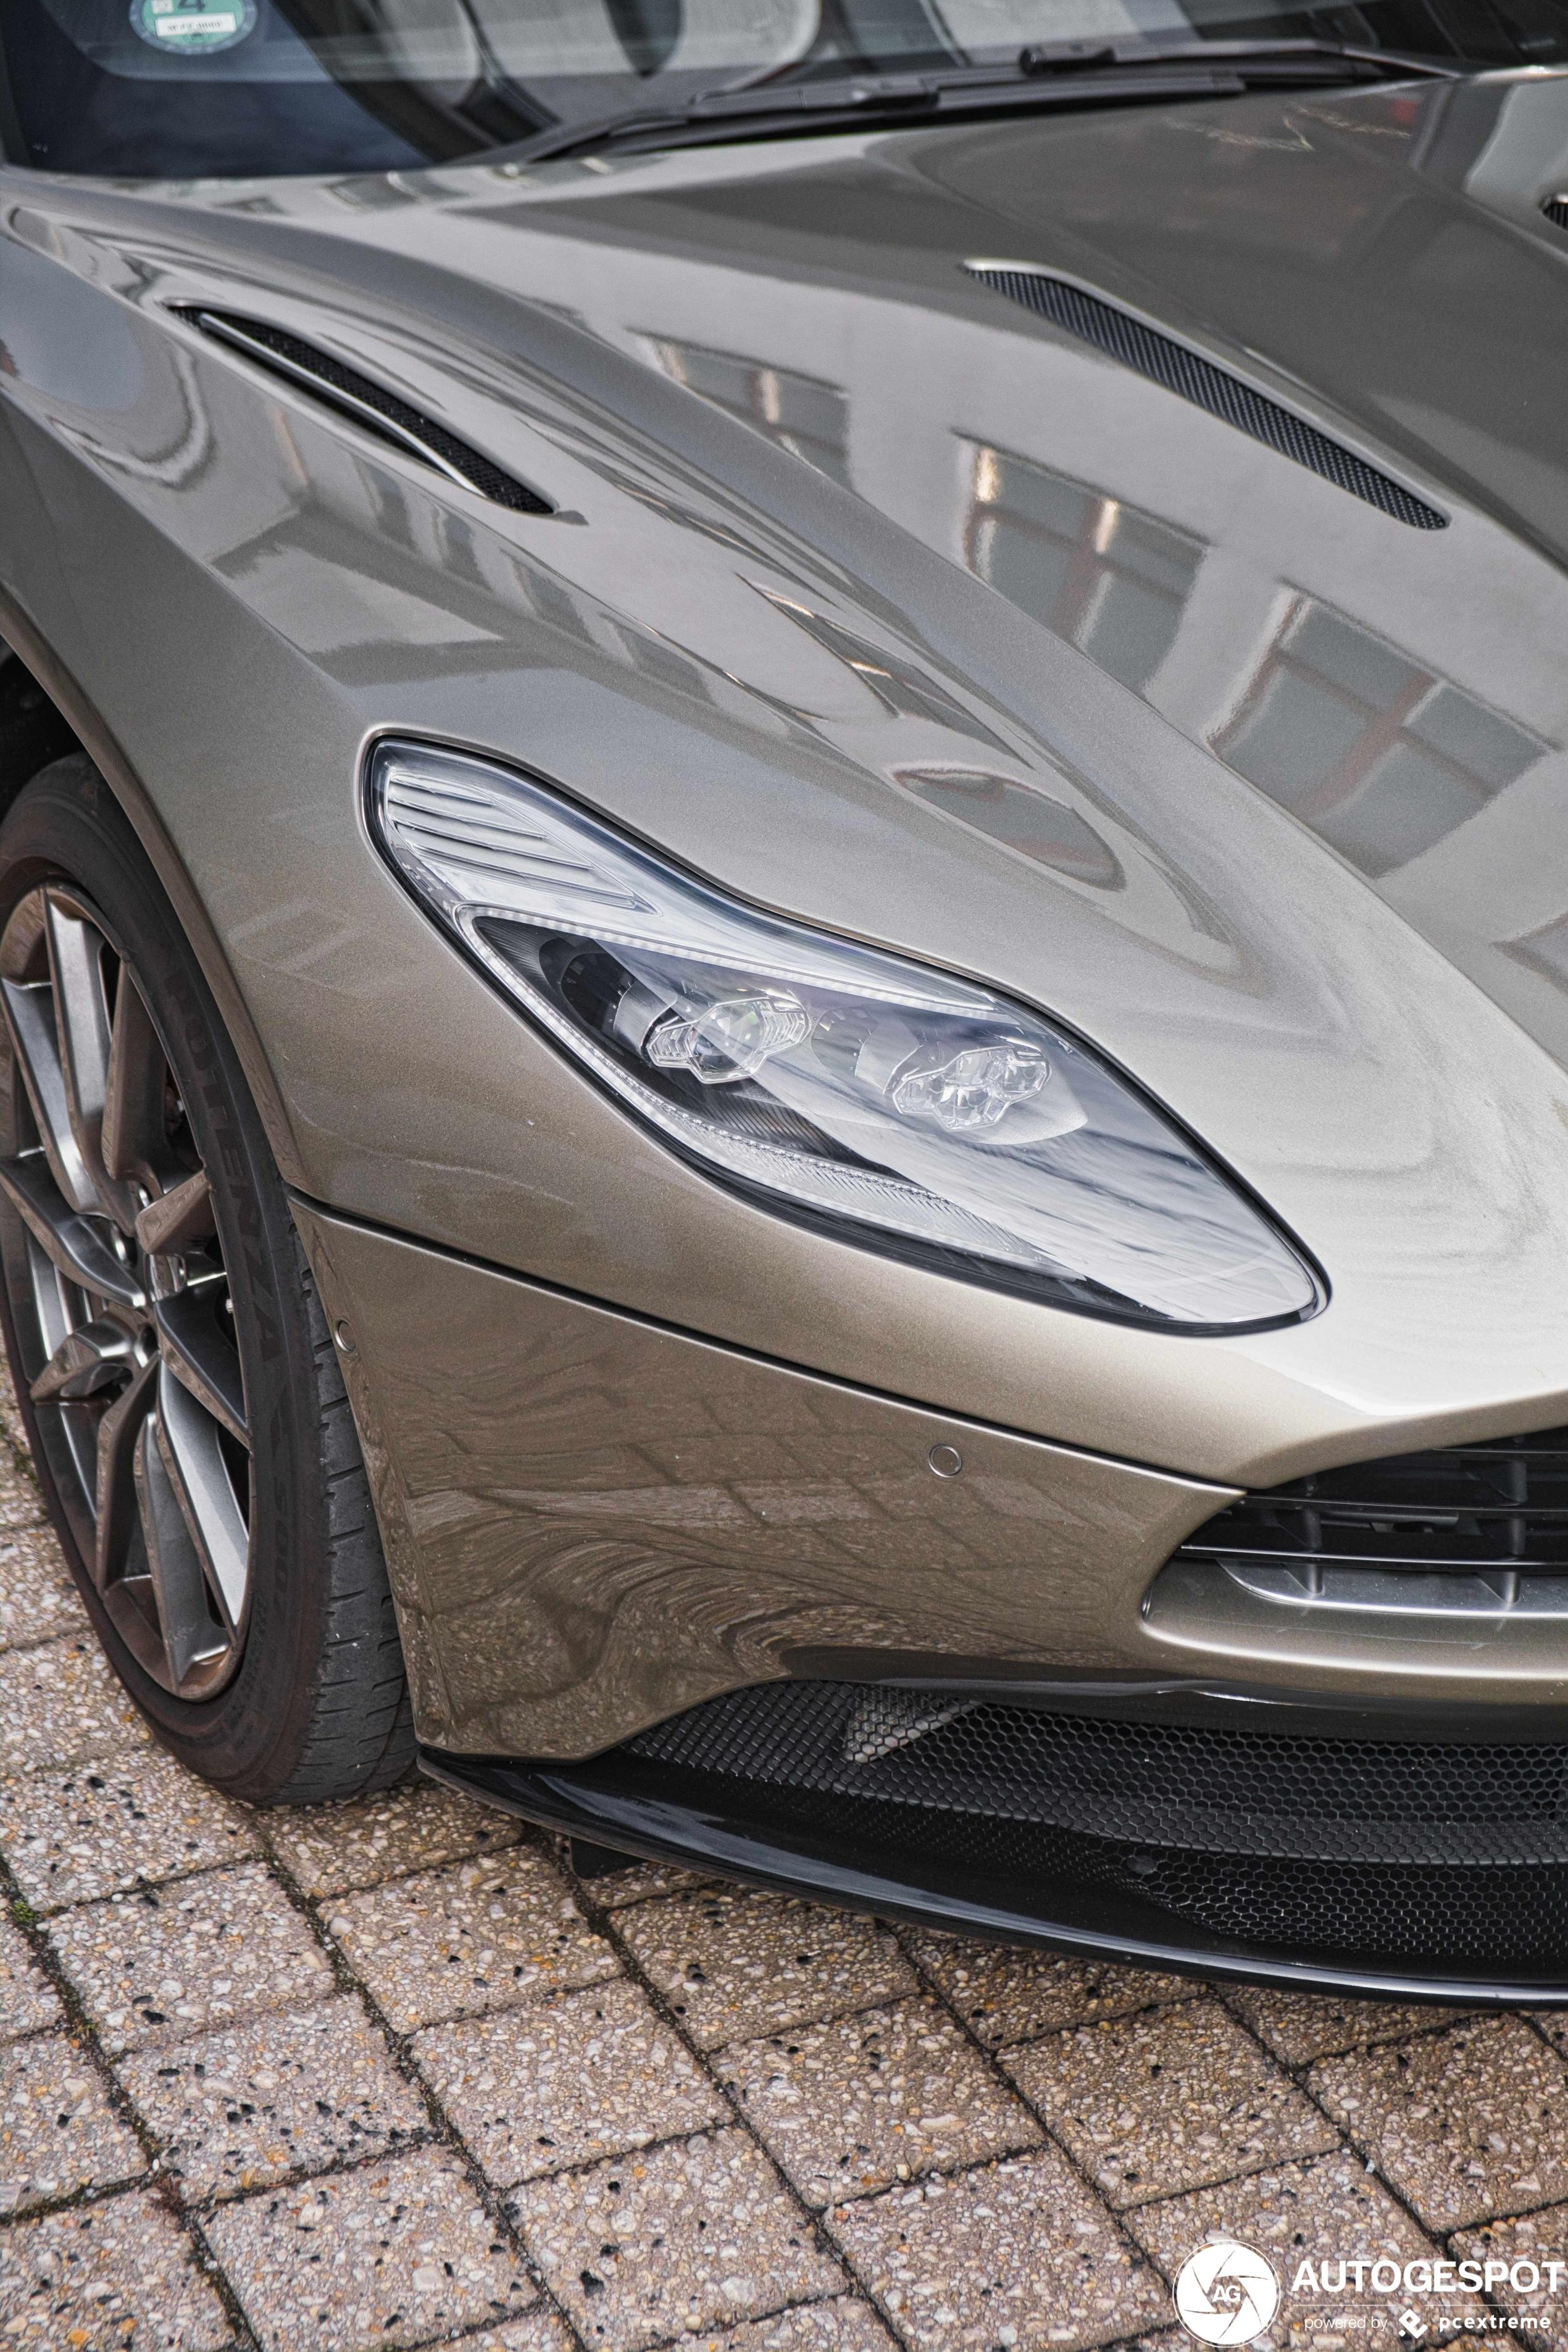 Aston Martin Db11 21 March 2021 Autogespot